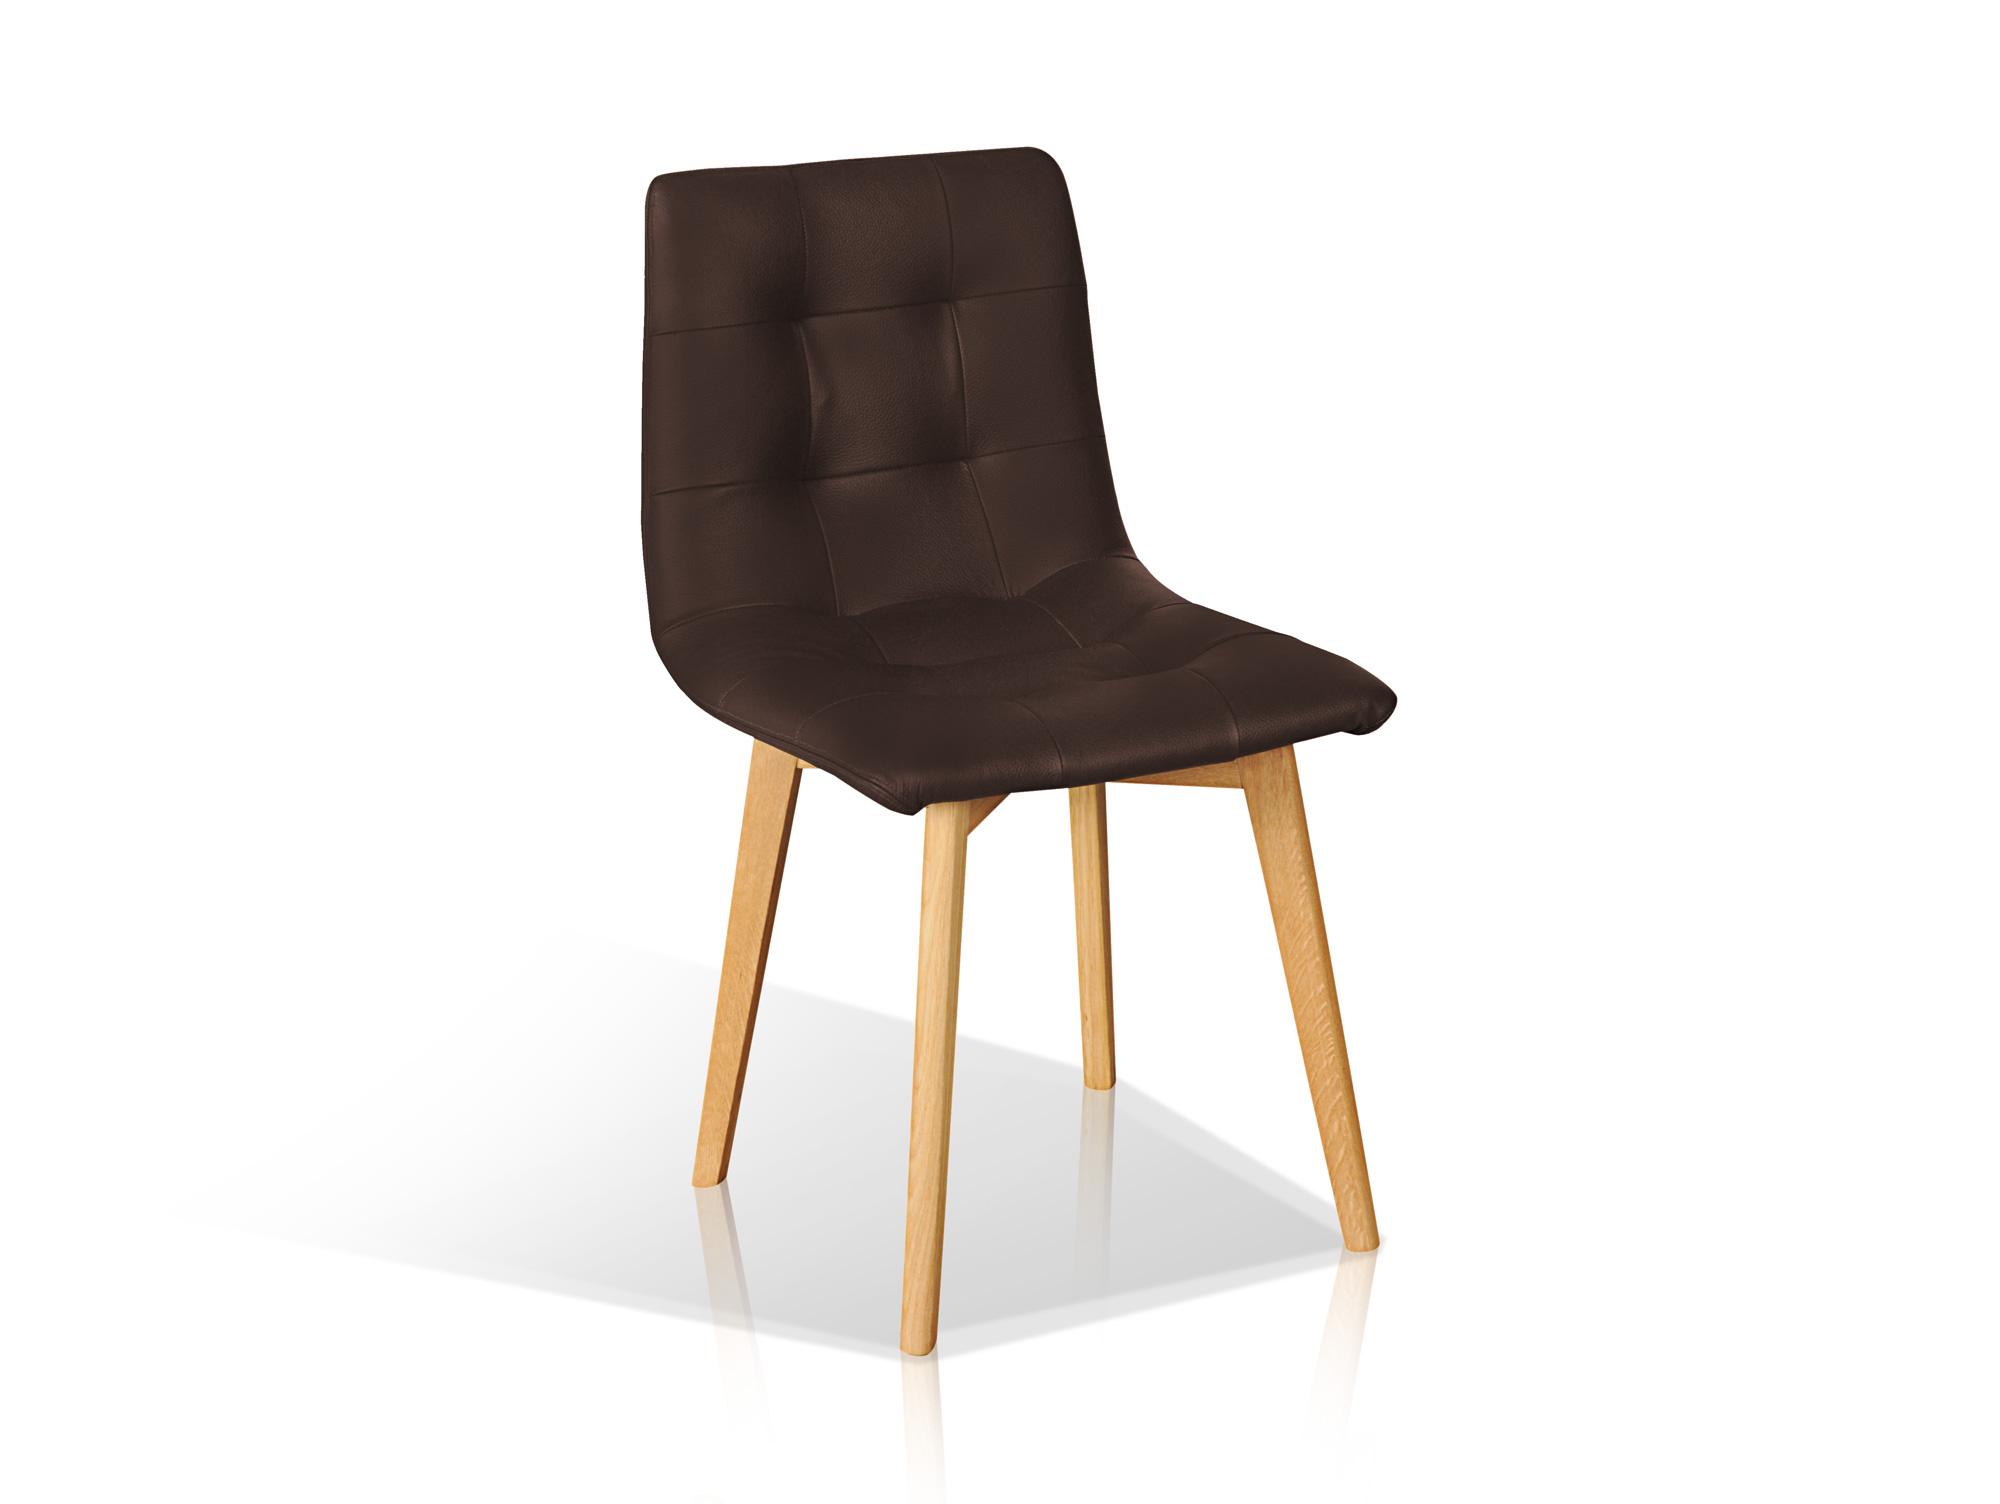 marvin esszimmerstuhl echtleder braun buche. Black Bedroom Furniture Sets. Home Design Ideas